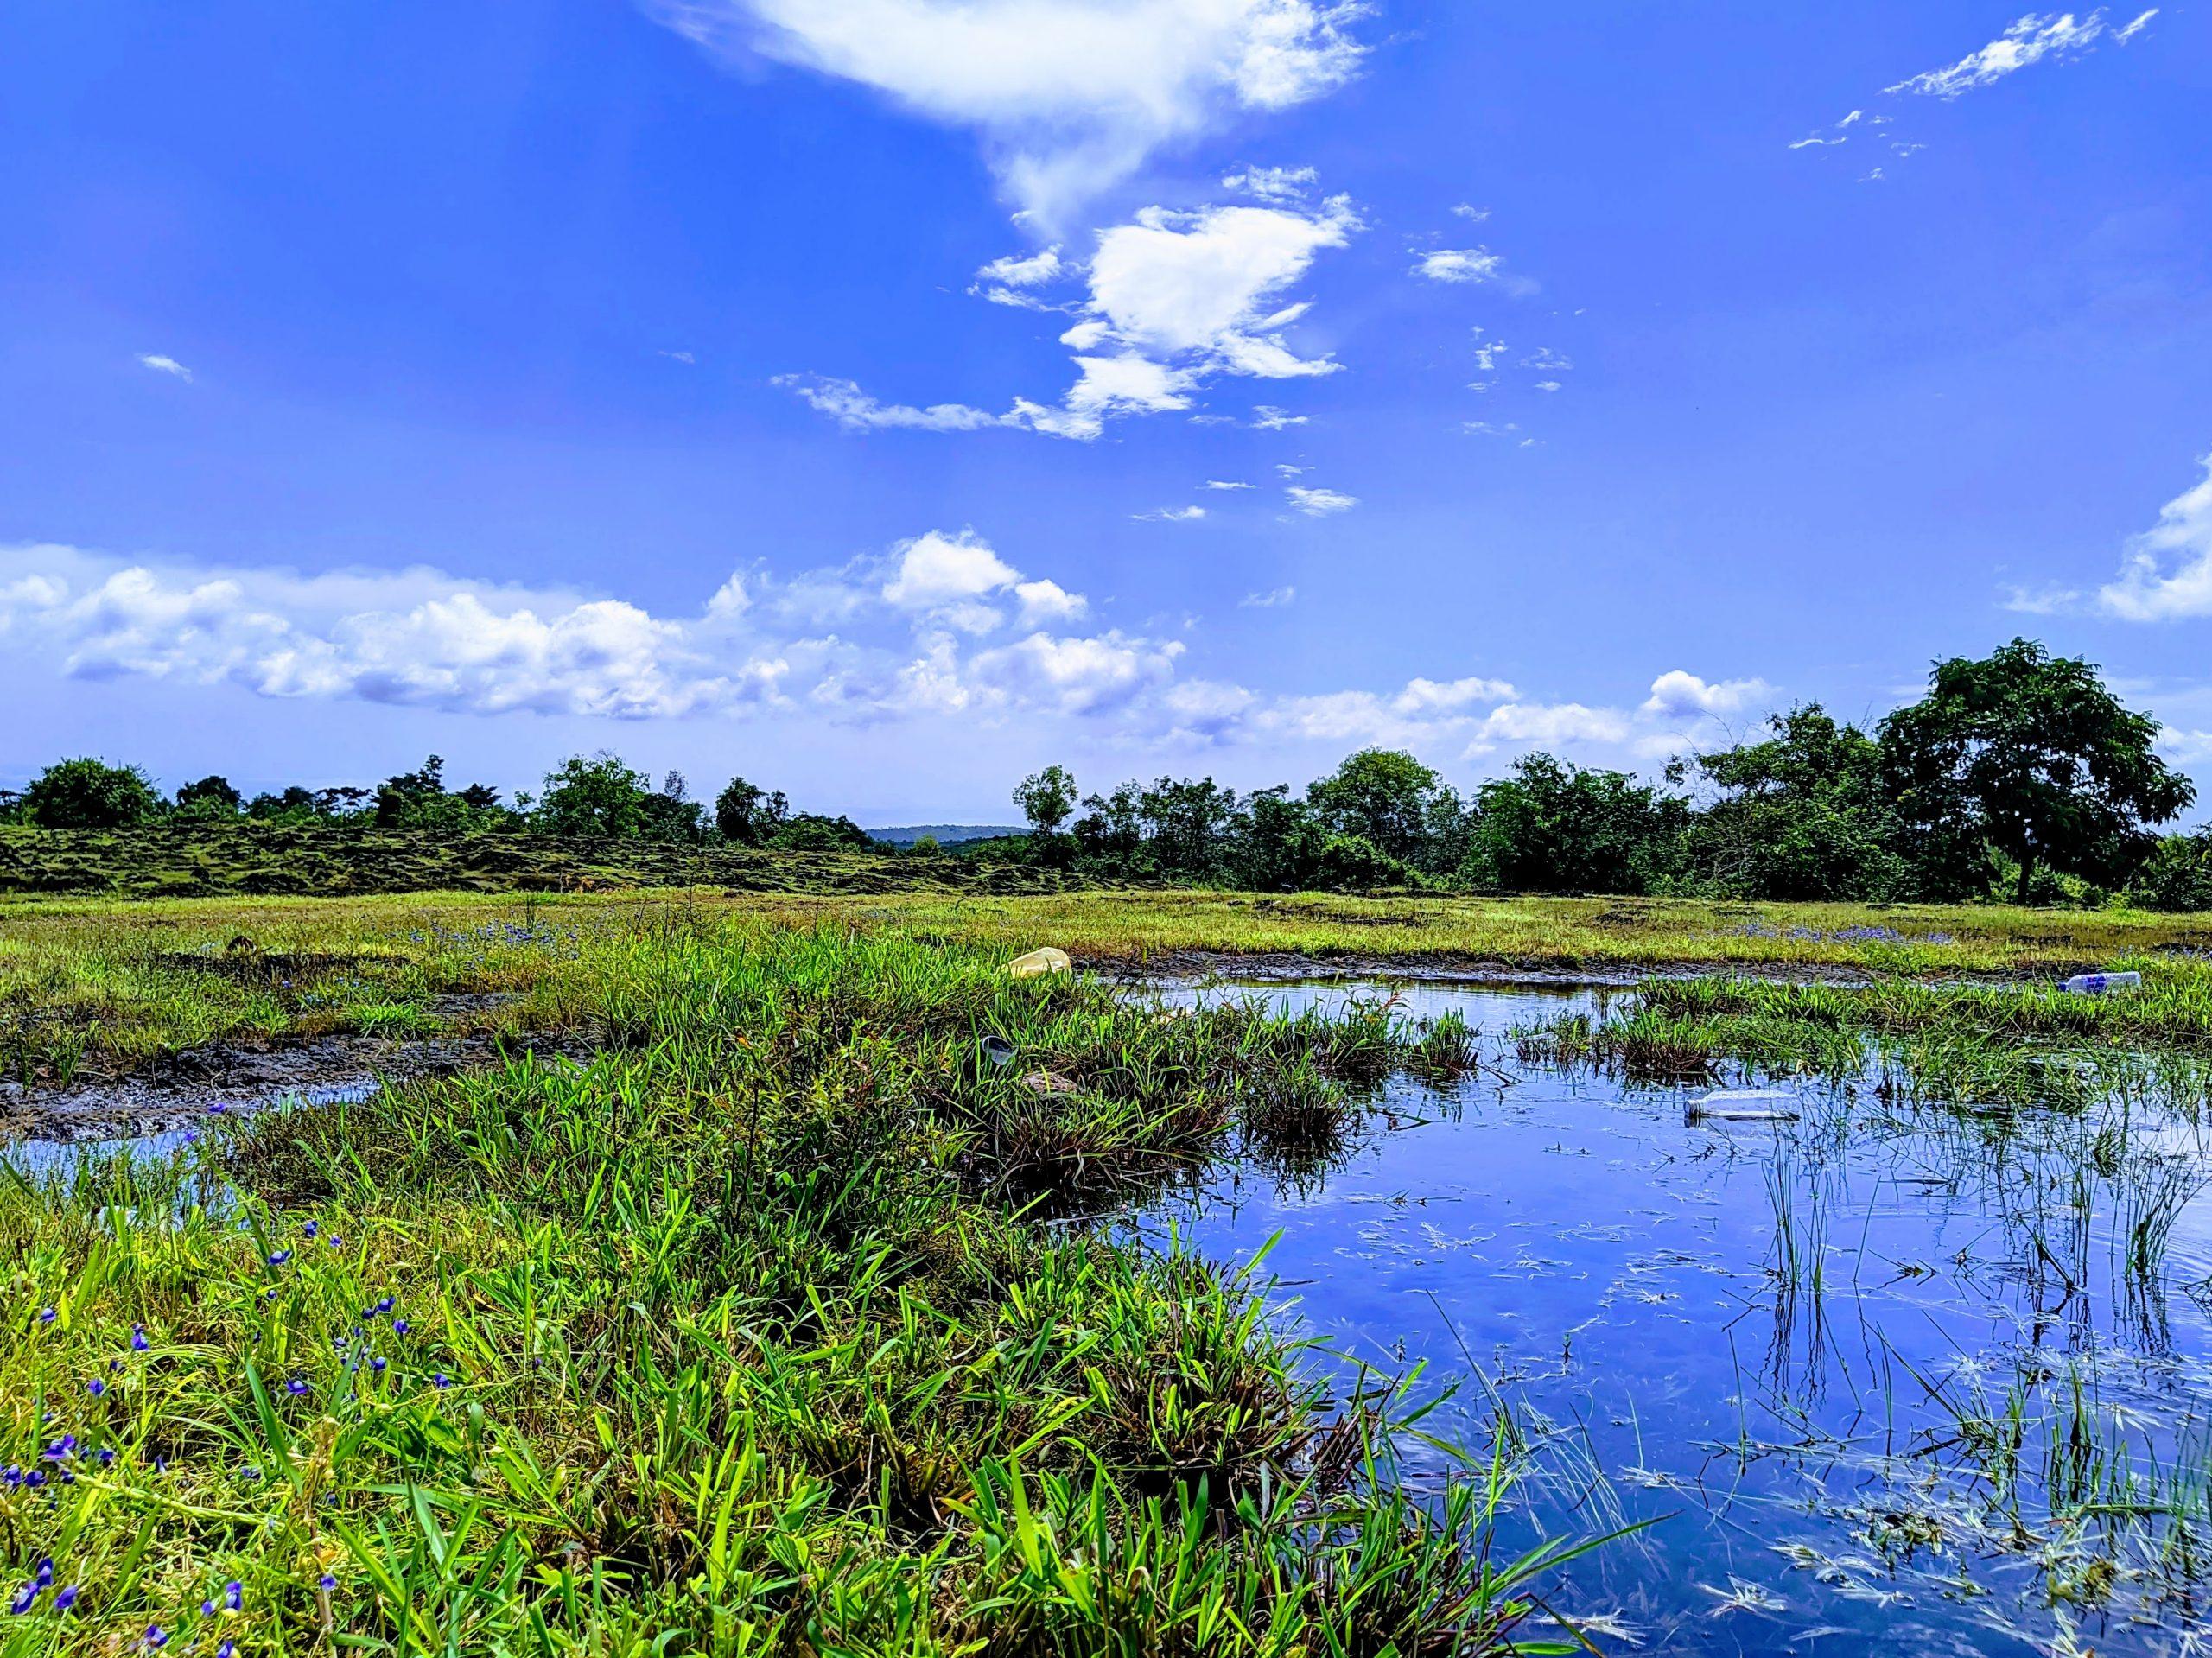 Swamp in a Plain